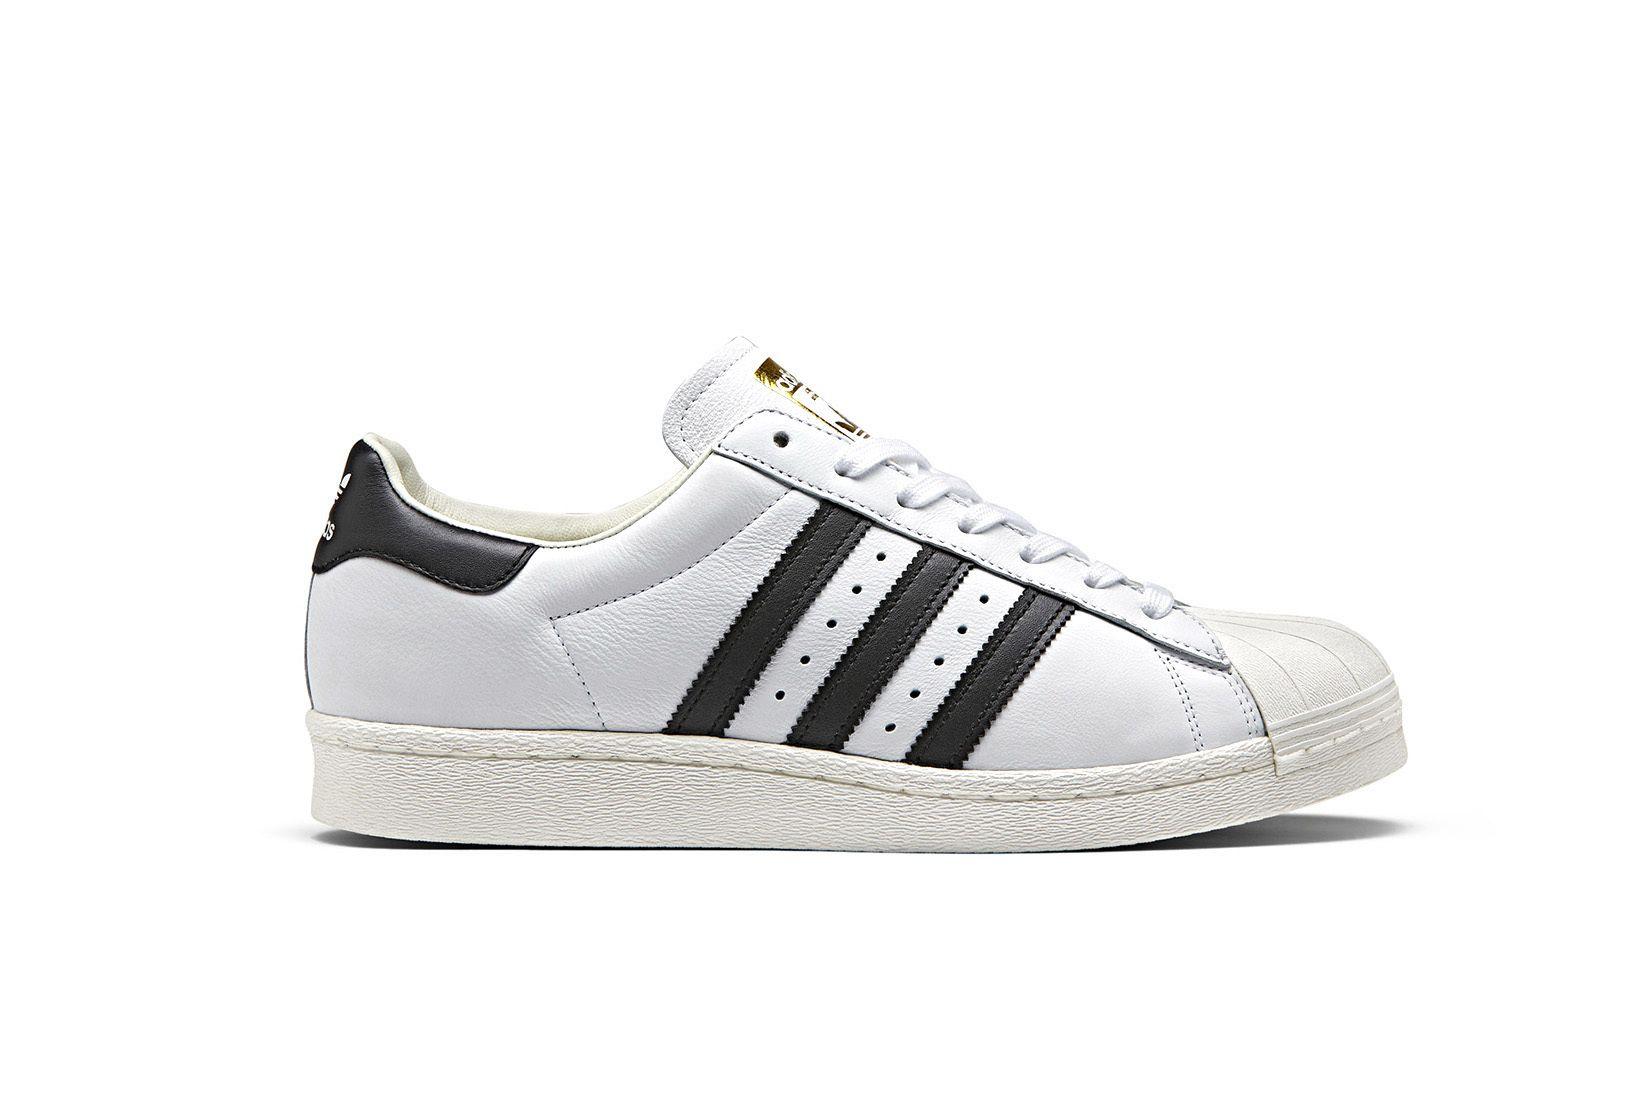 Adidas Originals Superstar Boost zapatilla Freakente Pinterest adidas